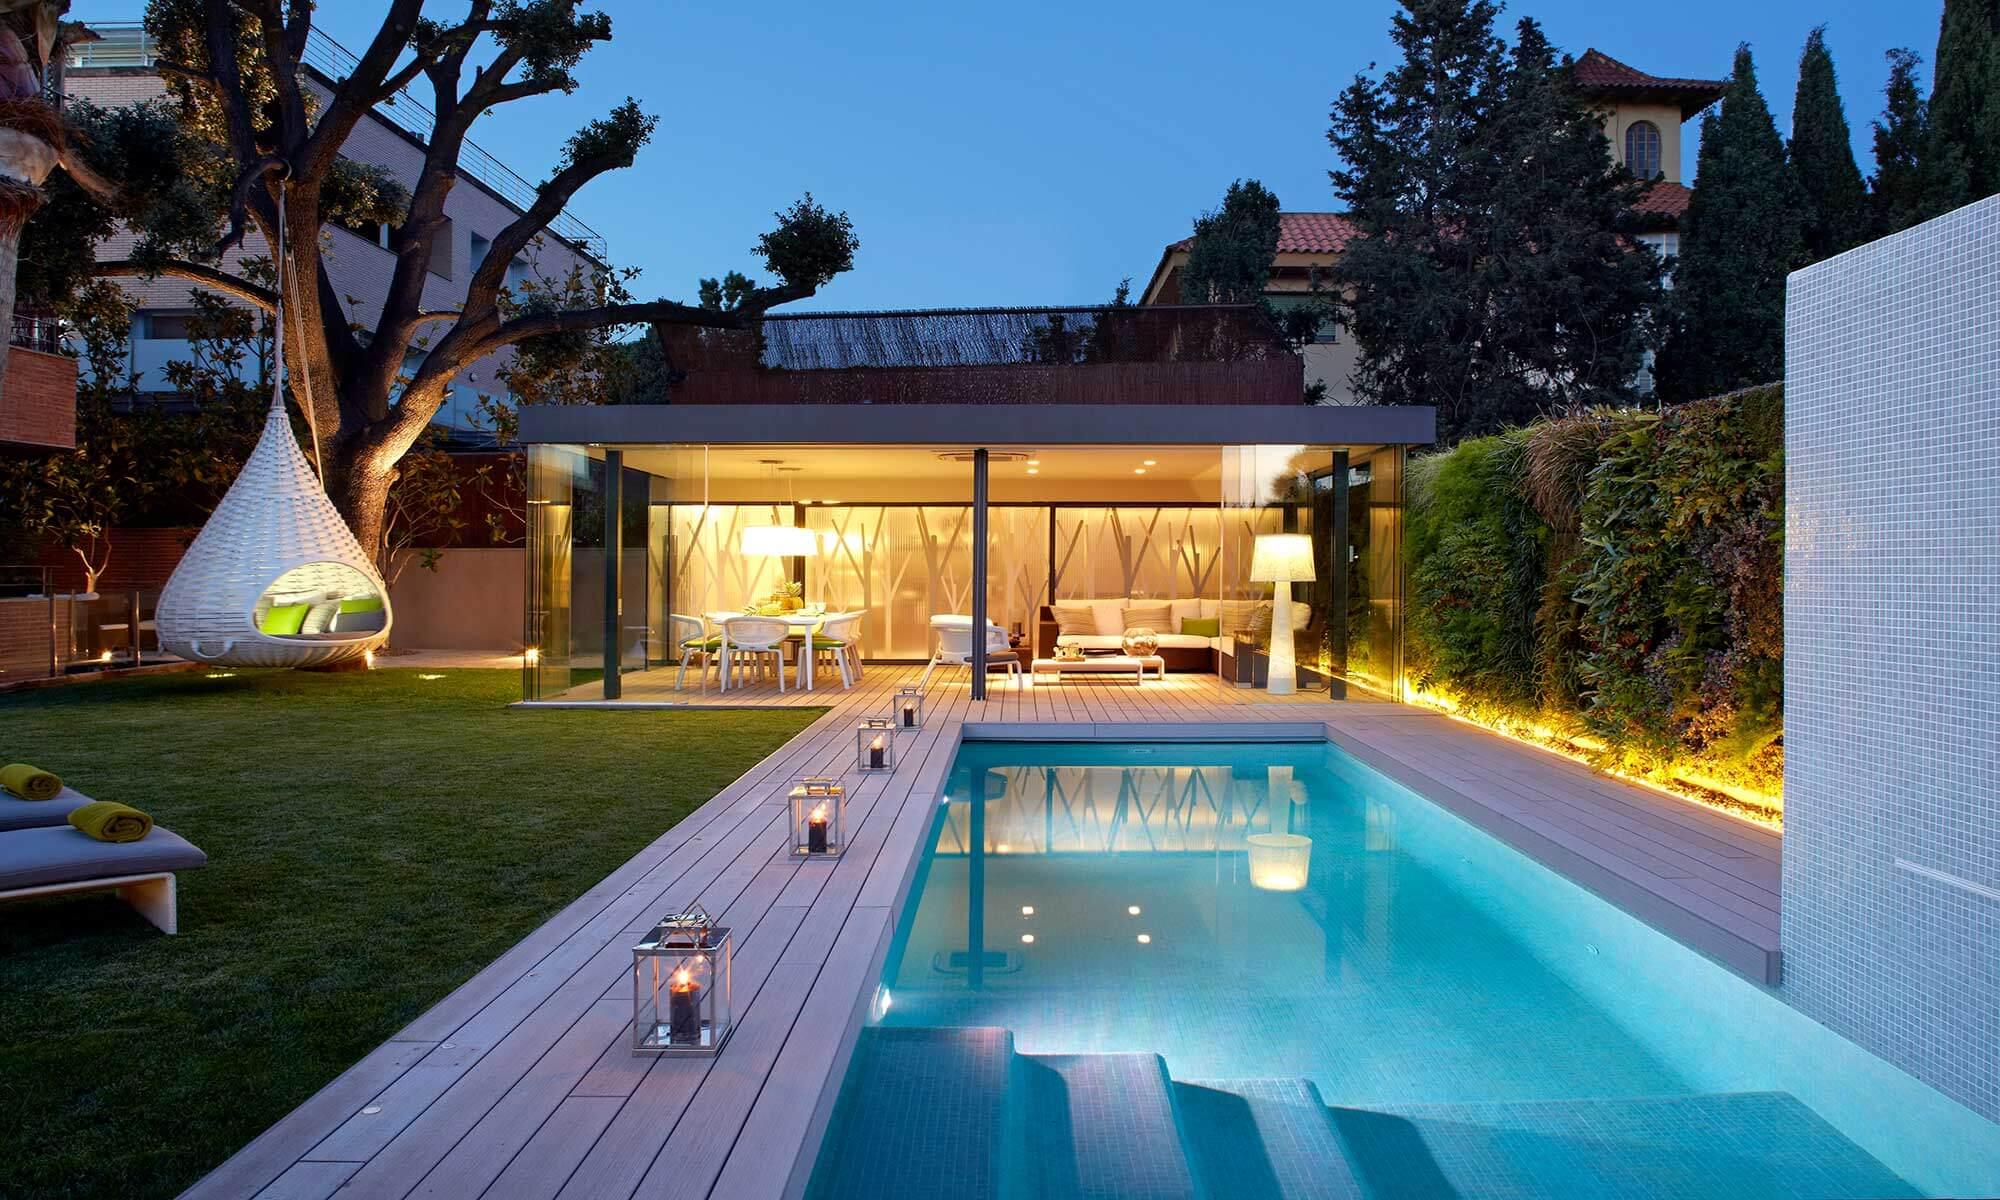 vertical garden in a swimingpool | Molins Design interior designers